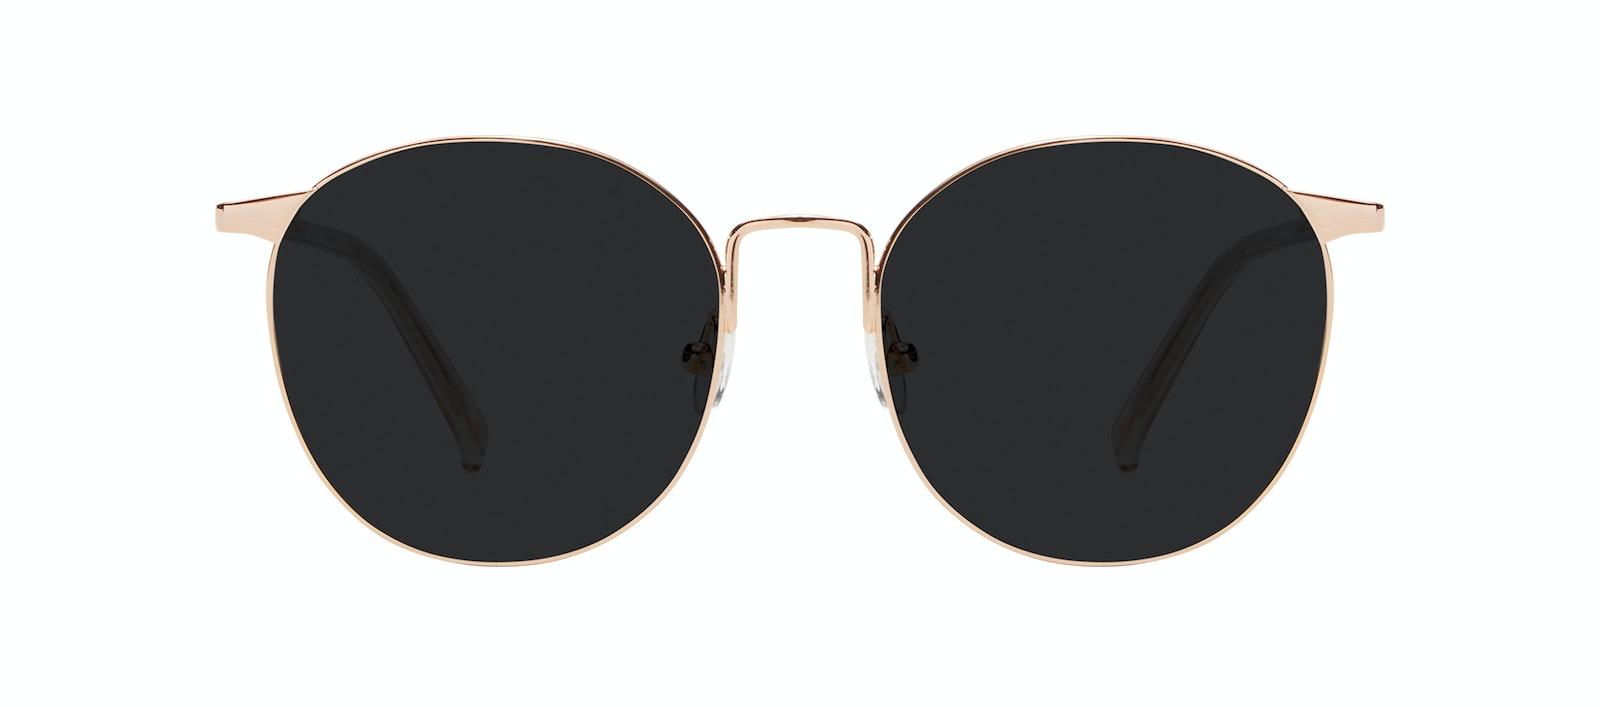 Affordable Fashion Glasses Round Sunglasses Women Romy Petite Aurore Front